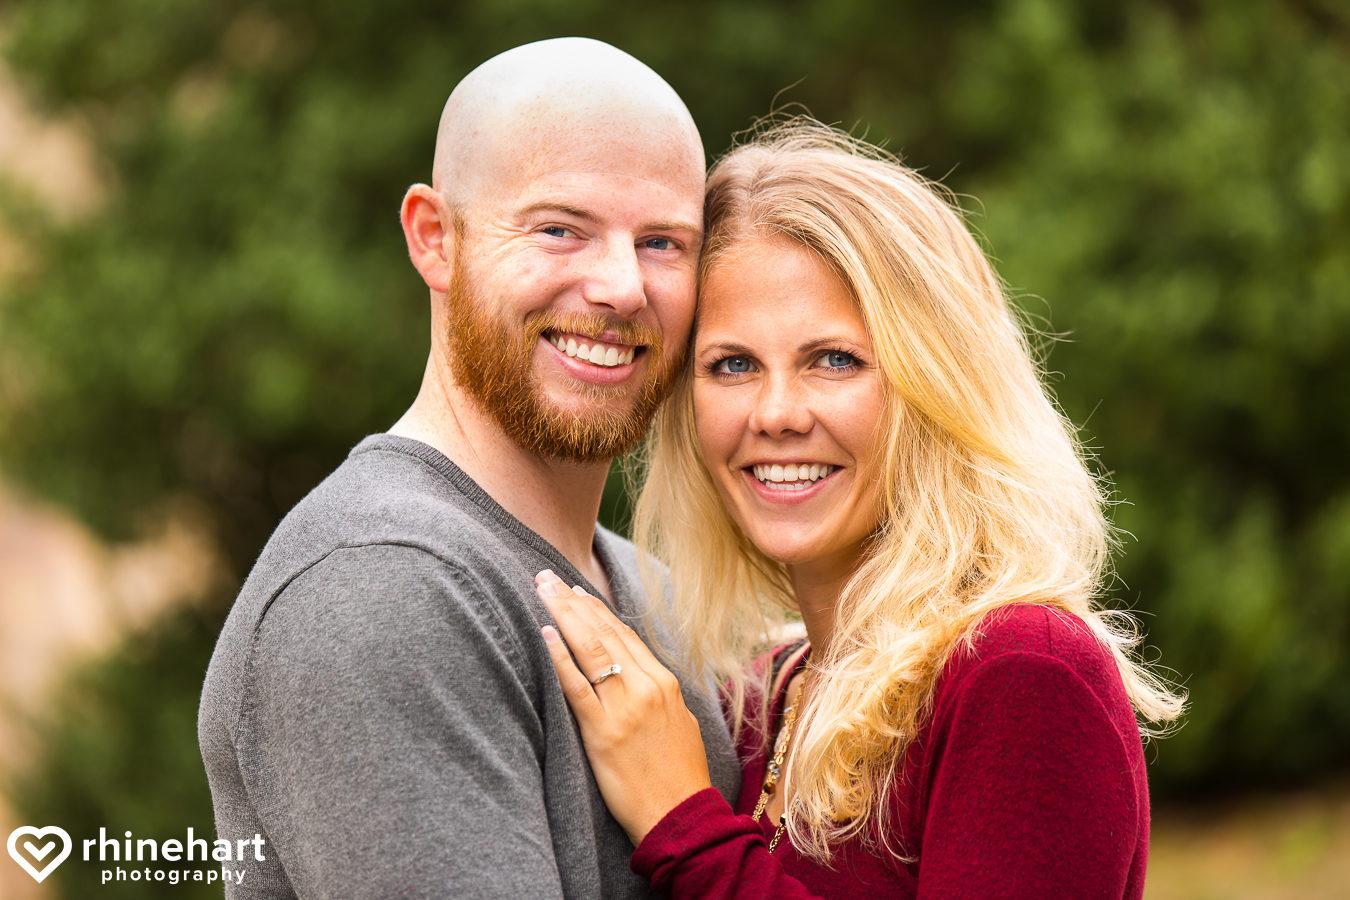 kings-gap-wedding-photographers-greencastle-frederick-carlisle-engagement-best-unique-candid-creative-5